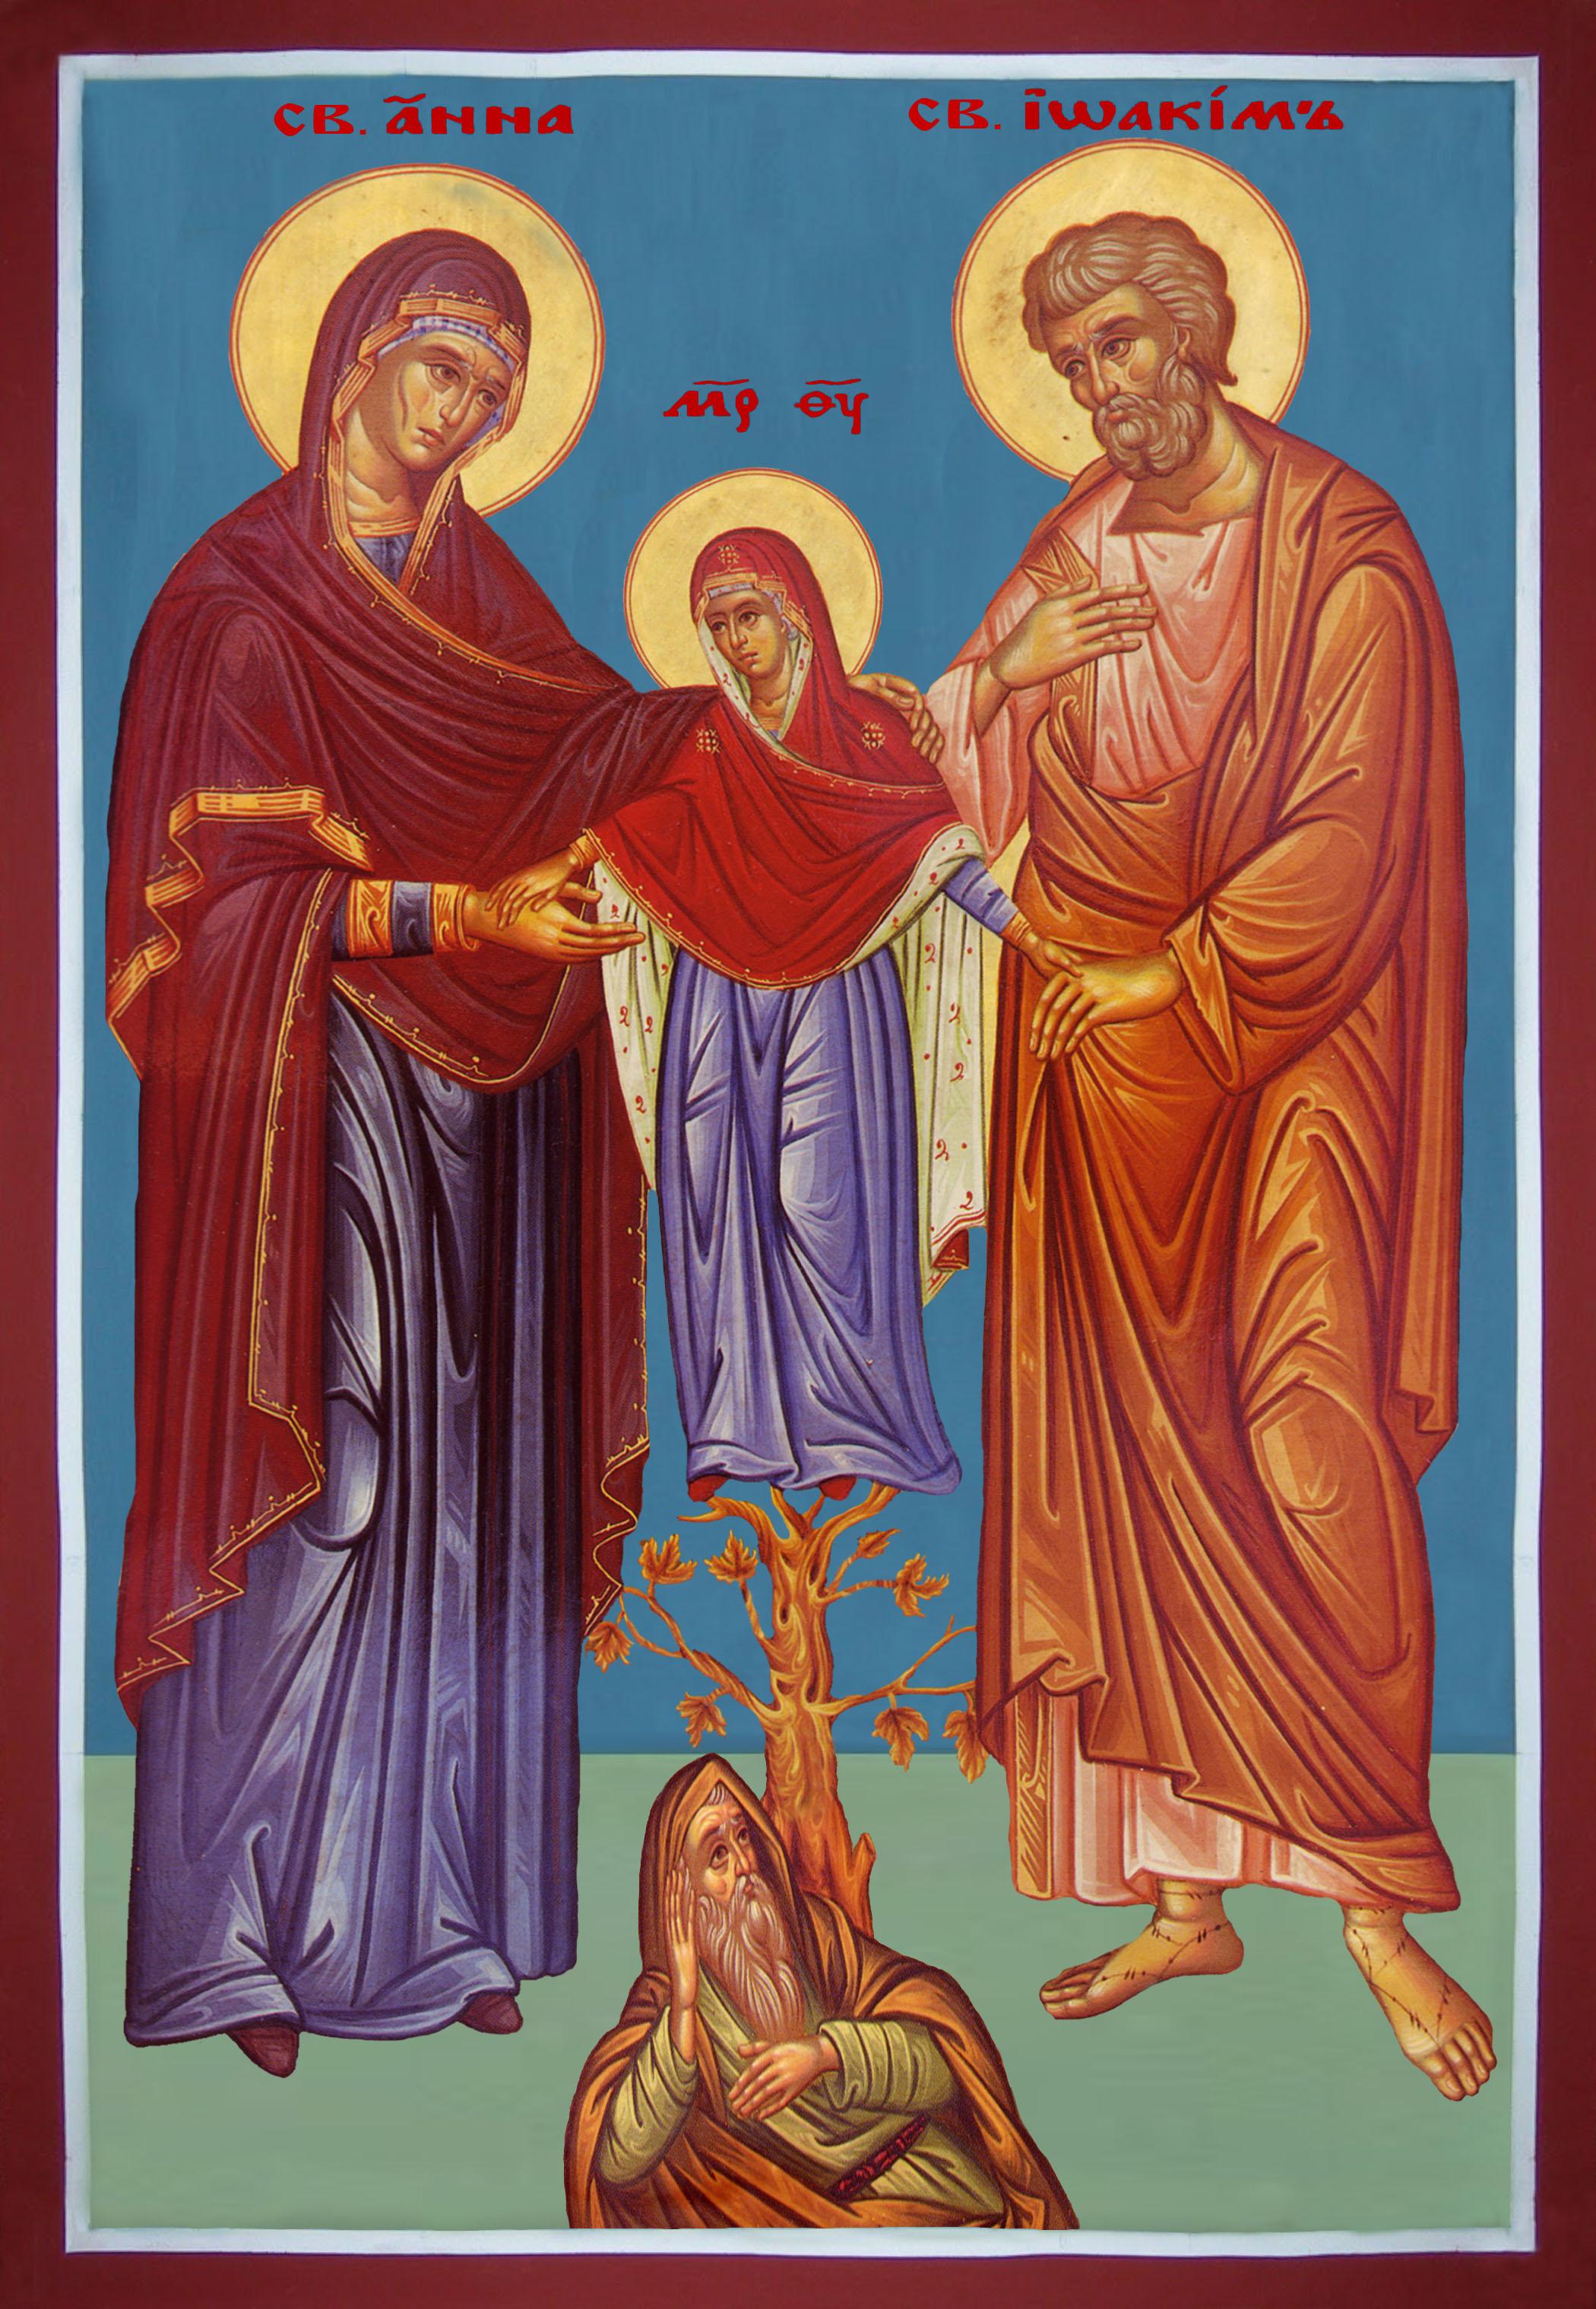 Резултат с изображение за Свети и праведни богоотци Йоаким и Анна